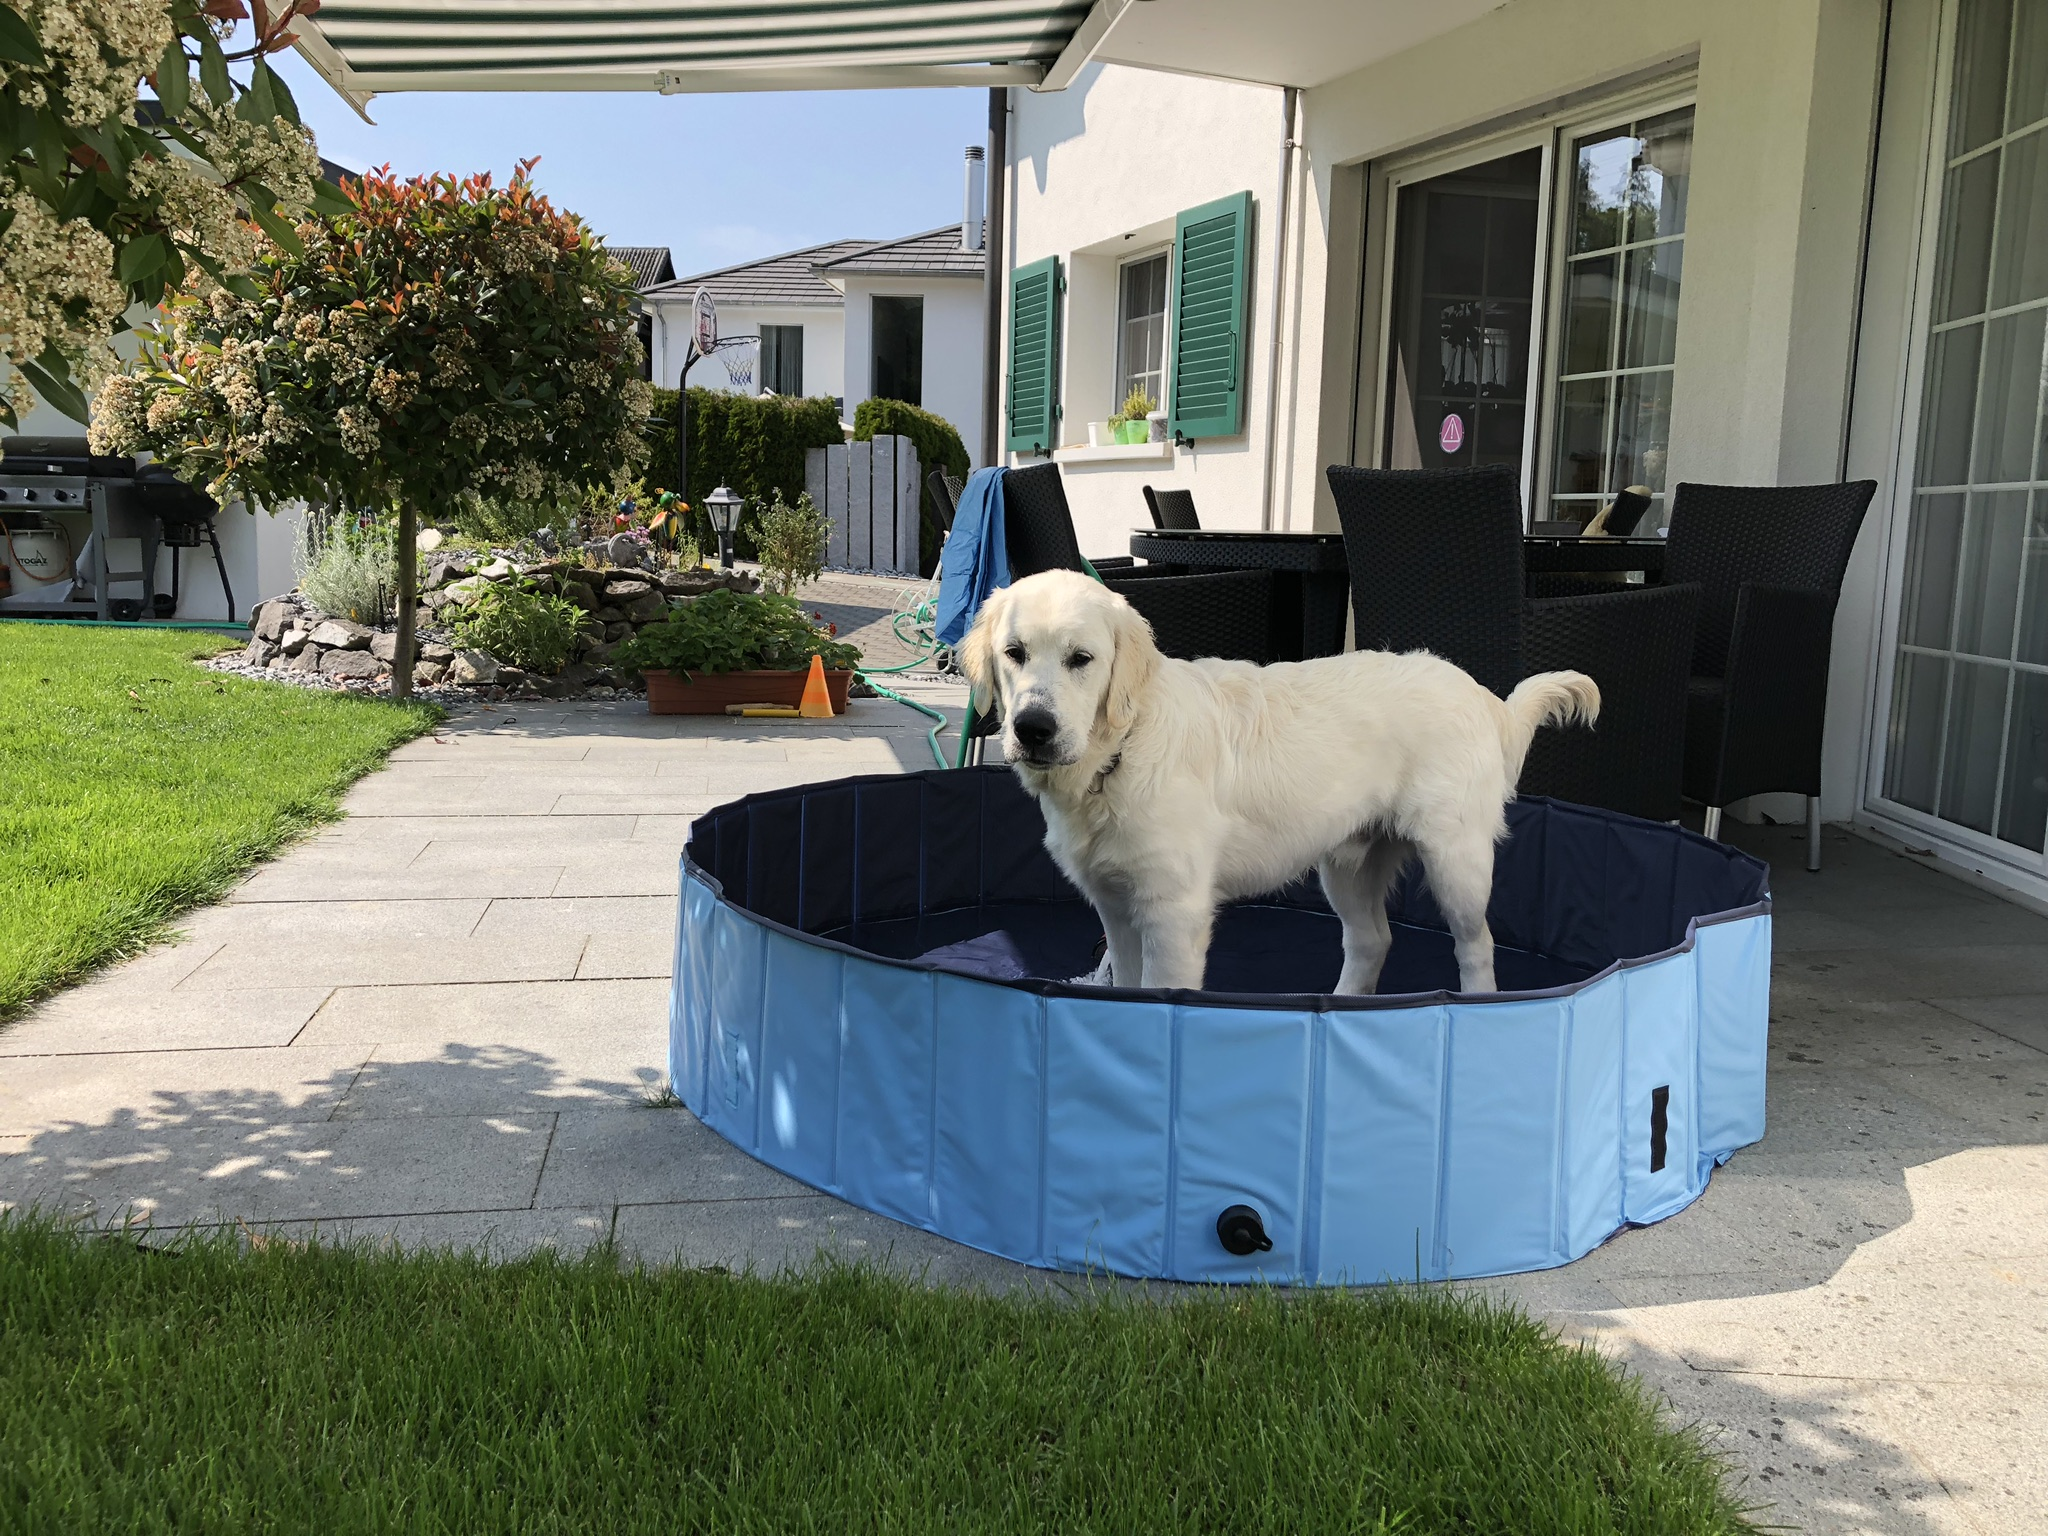 Mein neuer Swimmingpool im Garten